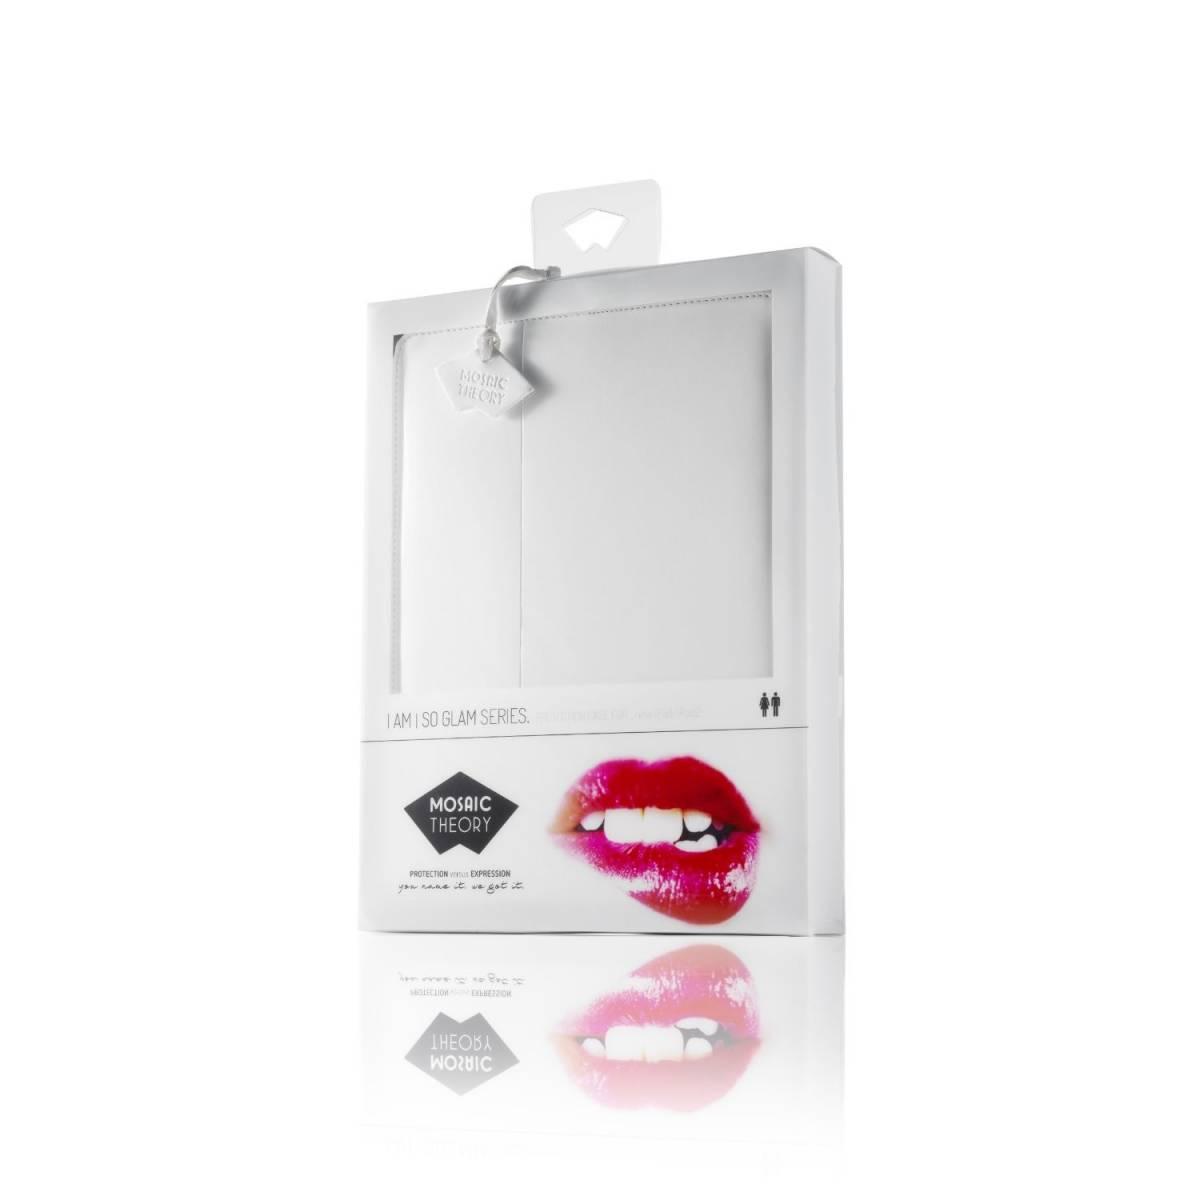 Mosaic Theory So Glam Serie Etui pour le nouvel iPad Blanc